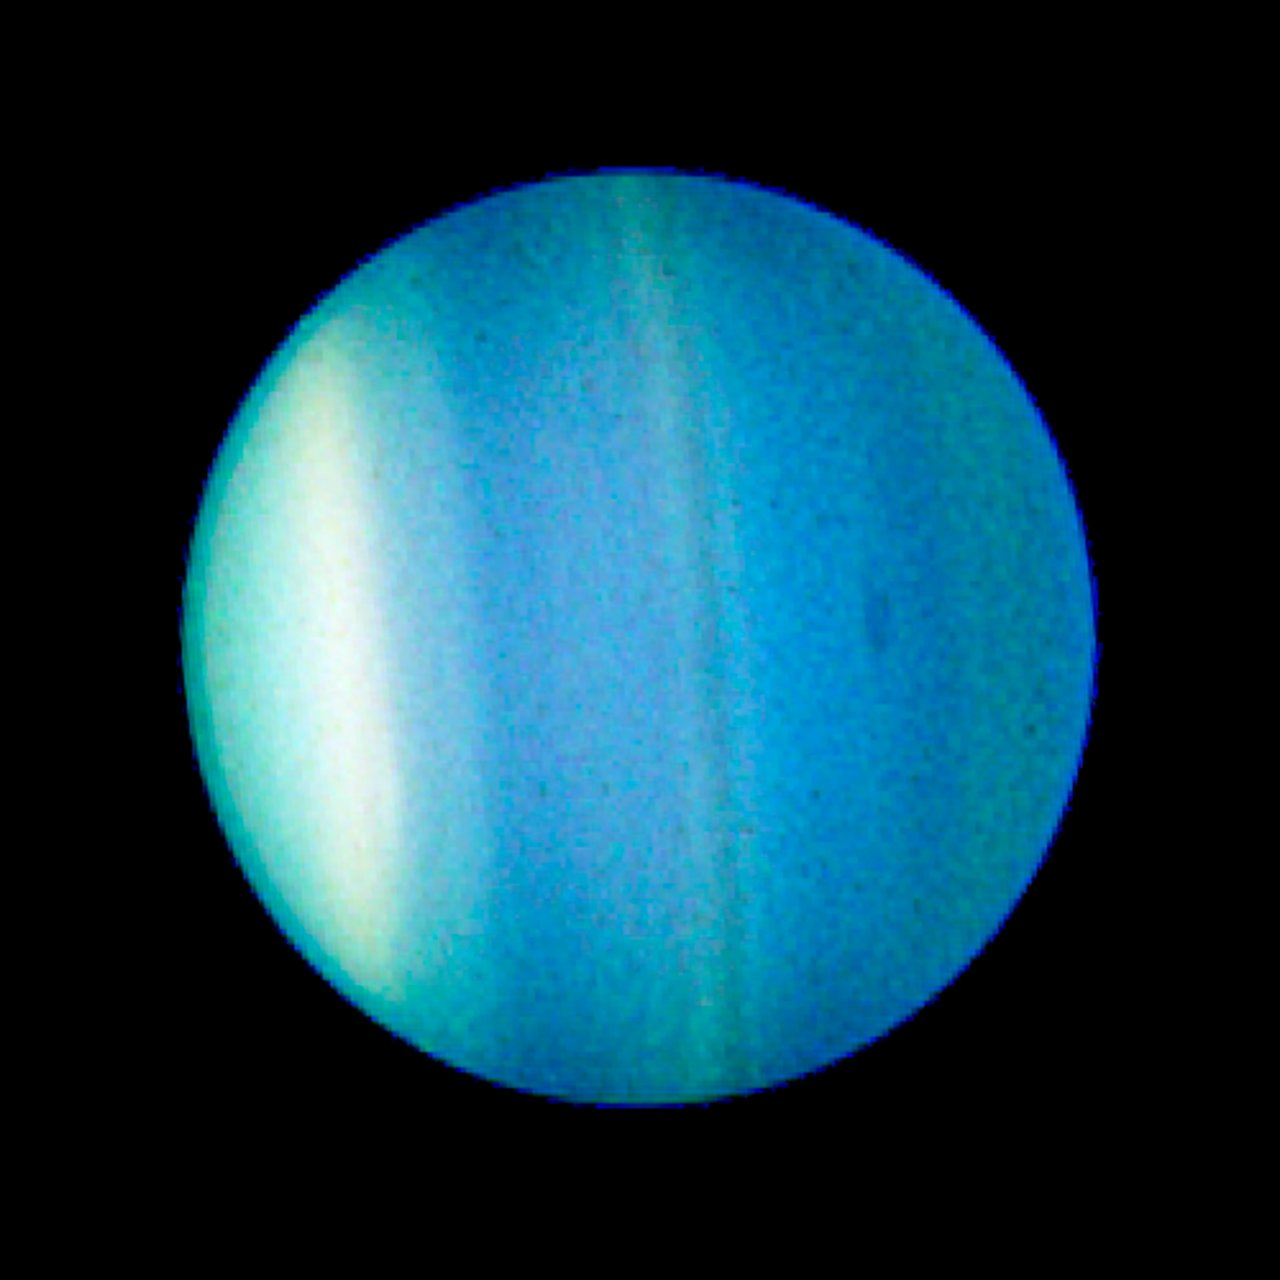 Uranus and Dark Spot - August 23, 2006